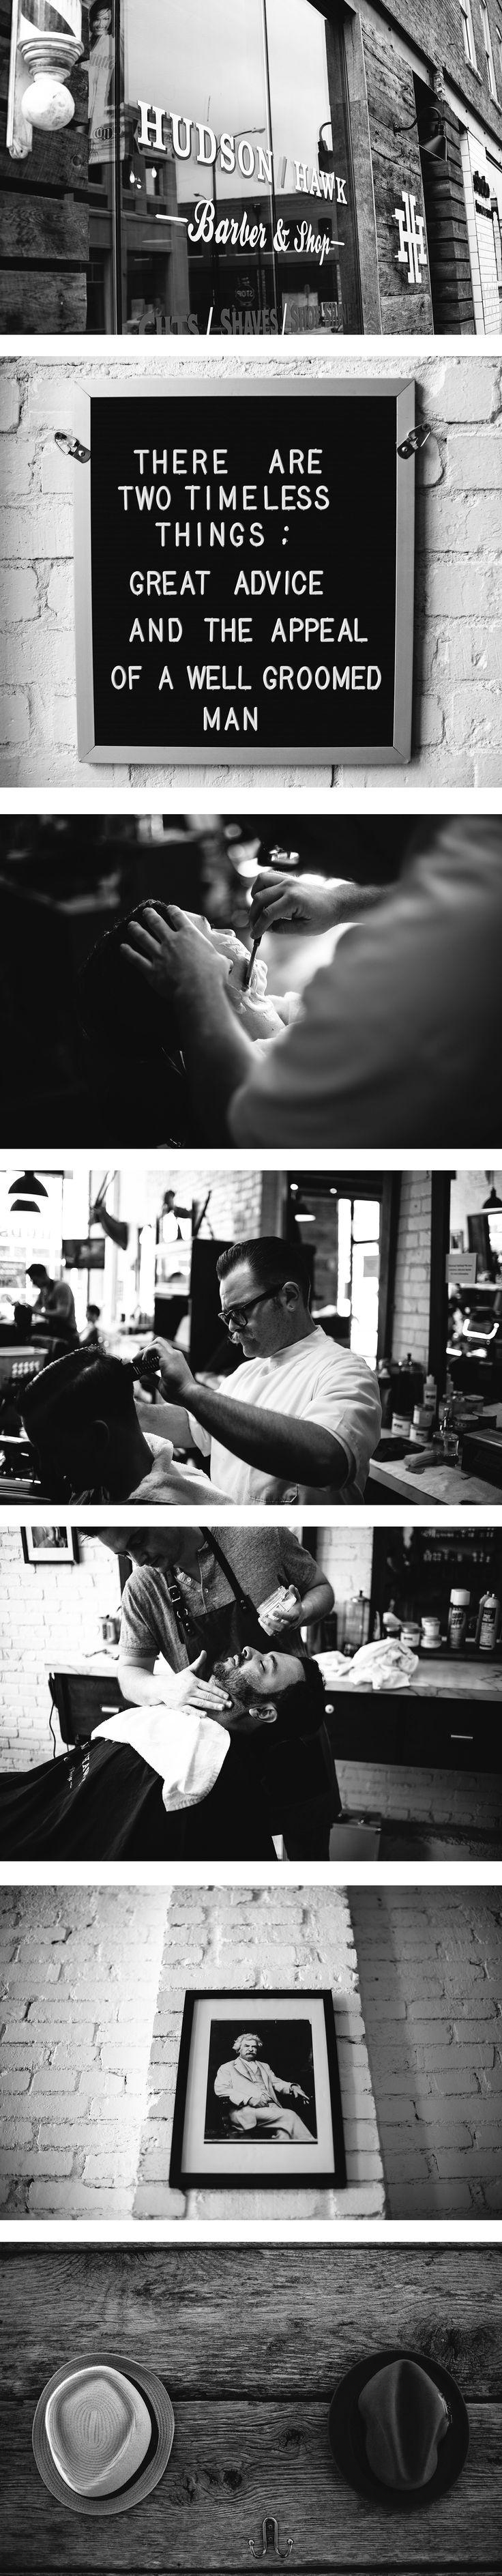 Hudson Hawk Barbers located in Springfield, MO.  A full service, ultra manly barber shop.    http://hudsonhawkbarbers.com/